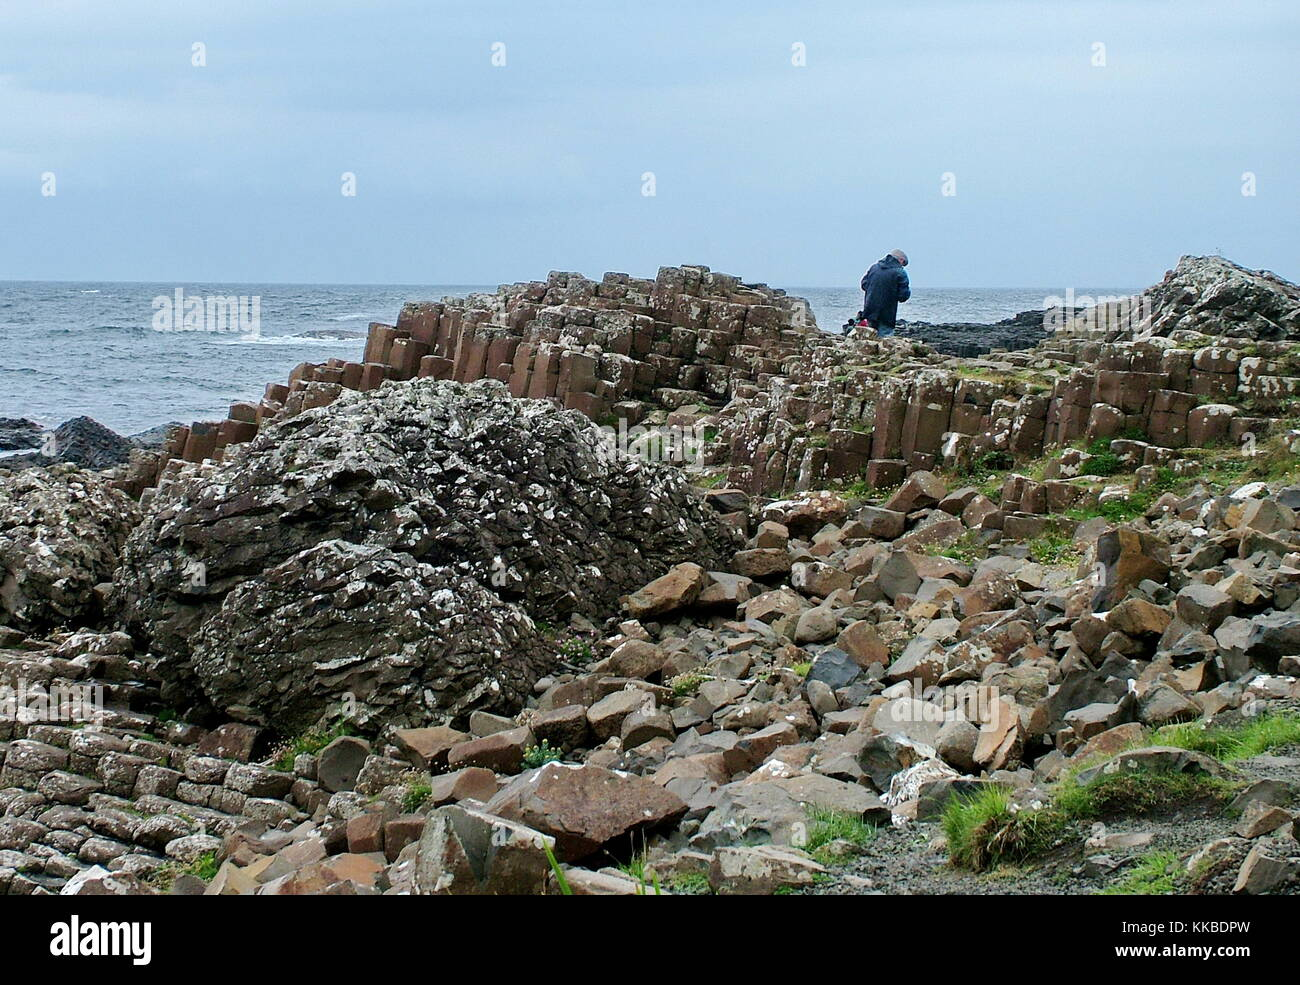 The Giants Causeway, County Antrim, Northern Ireland, United Kingdom - Stock Image